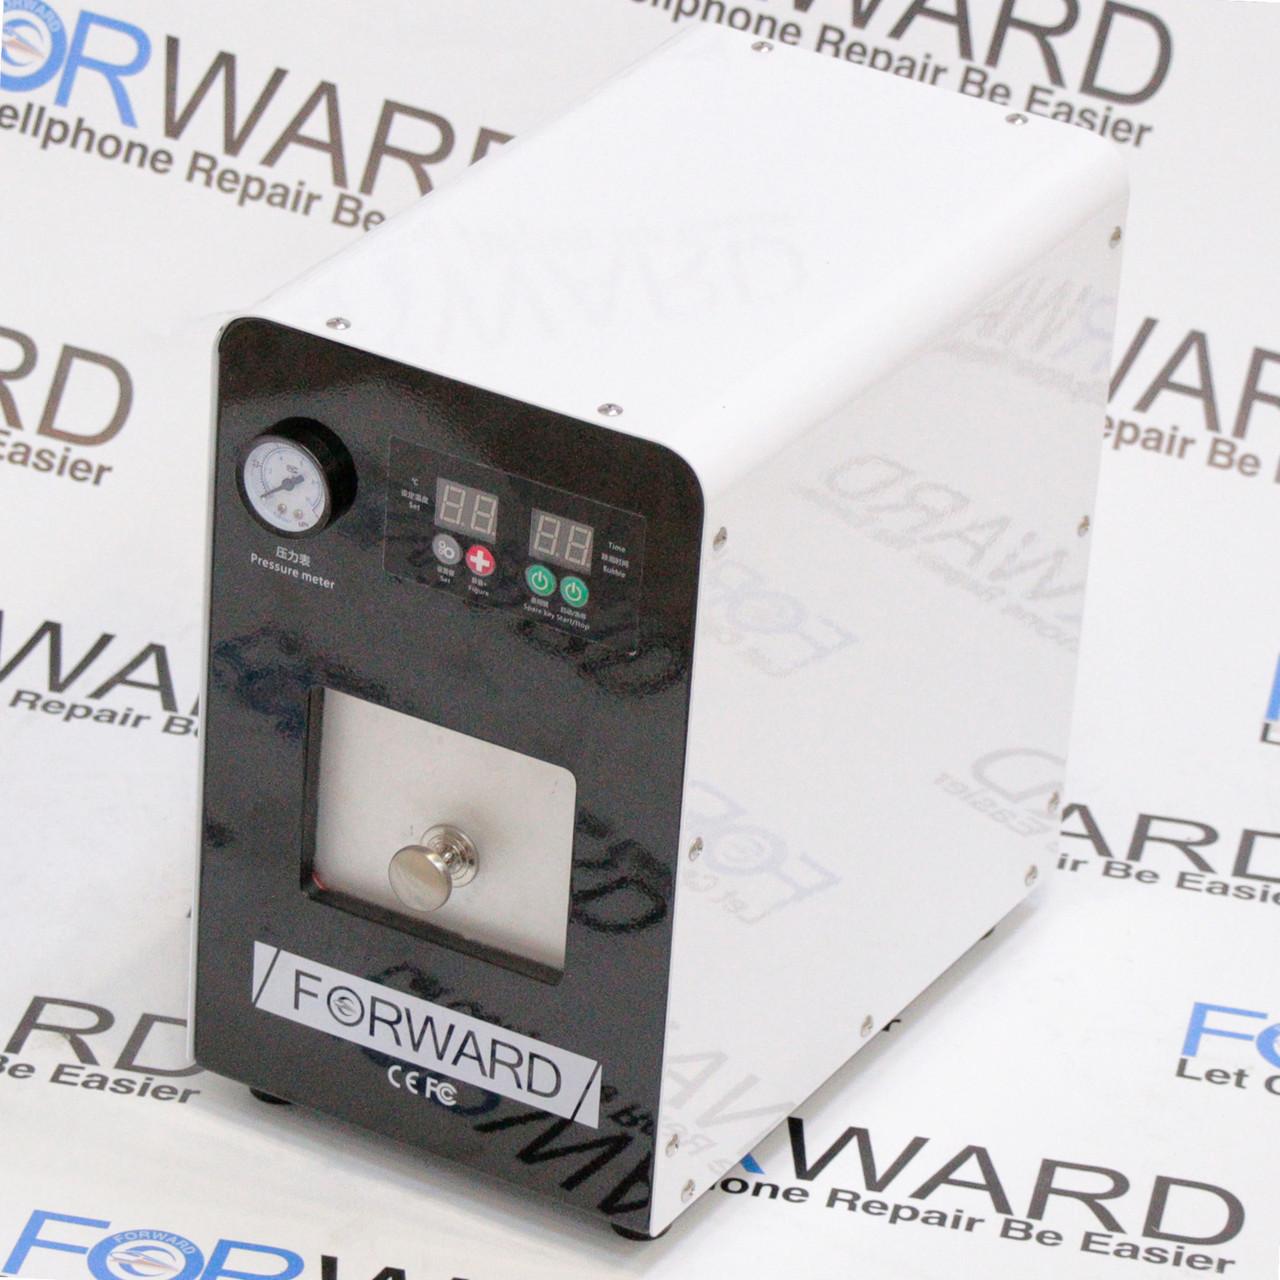 Автоклав Small Forward FW-09R (10') для удаления пузырьков iPhone и iPad